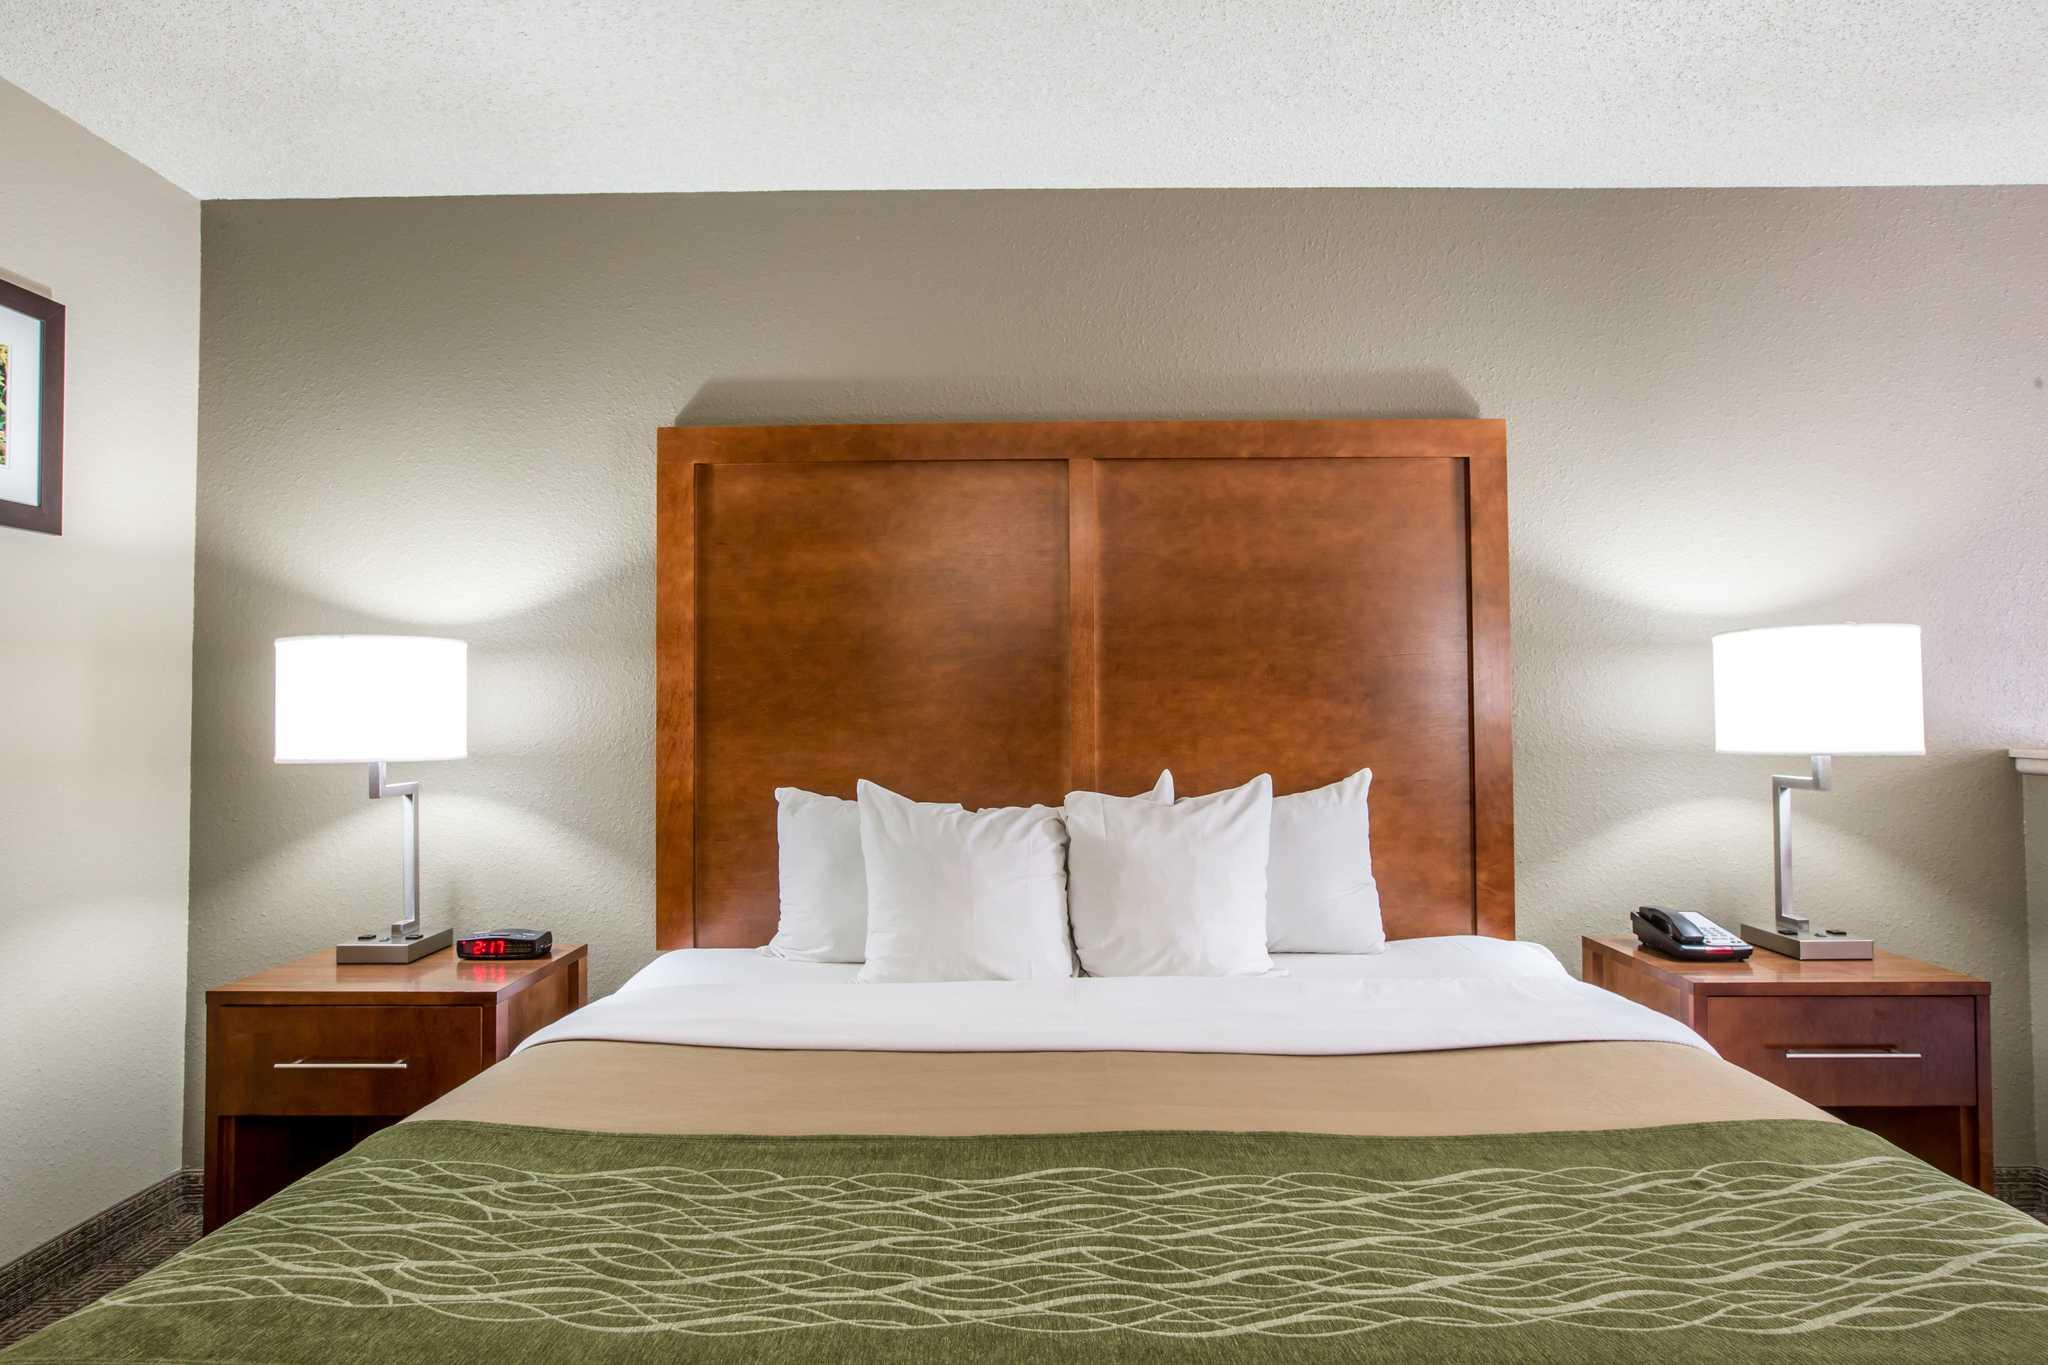 Comfort Inn & Suites at Dollywood Lane image 28